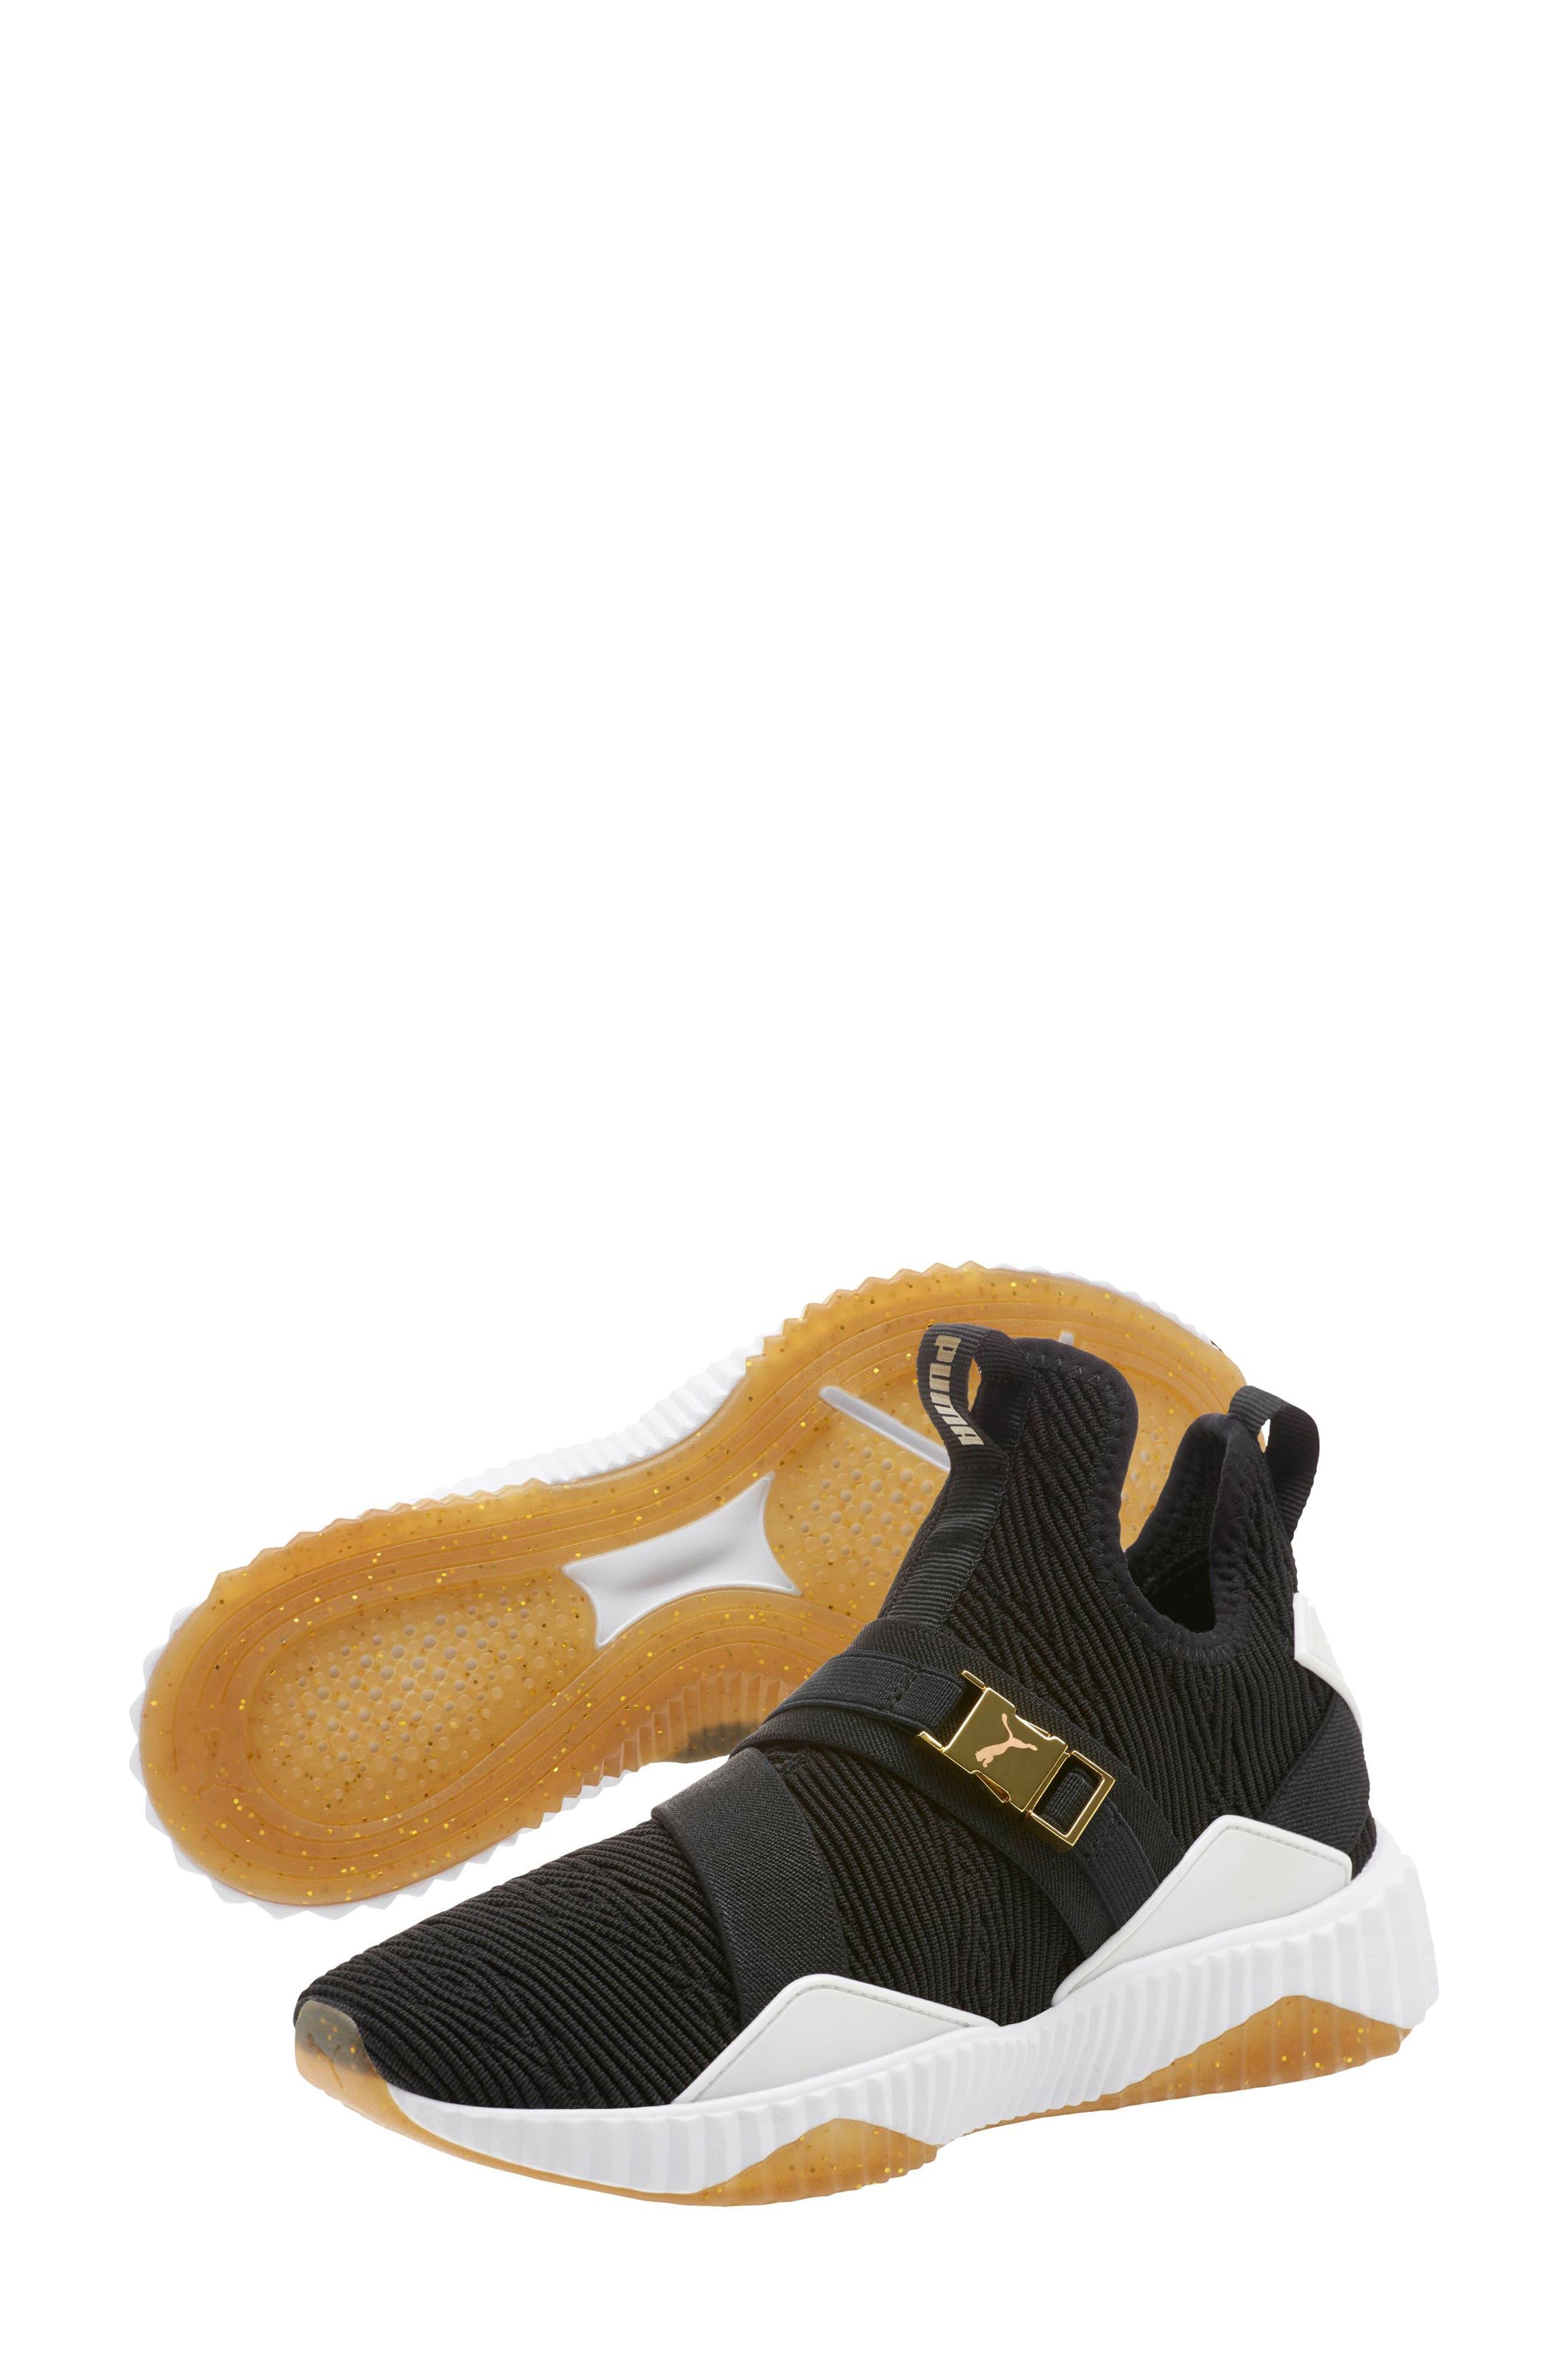 Defy Mid Varsity Sneaker,                             Alternate thumbnail 6, color,                             PUMA BLACK/ METALLIC GOLD